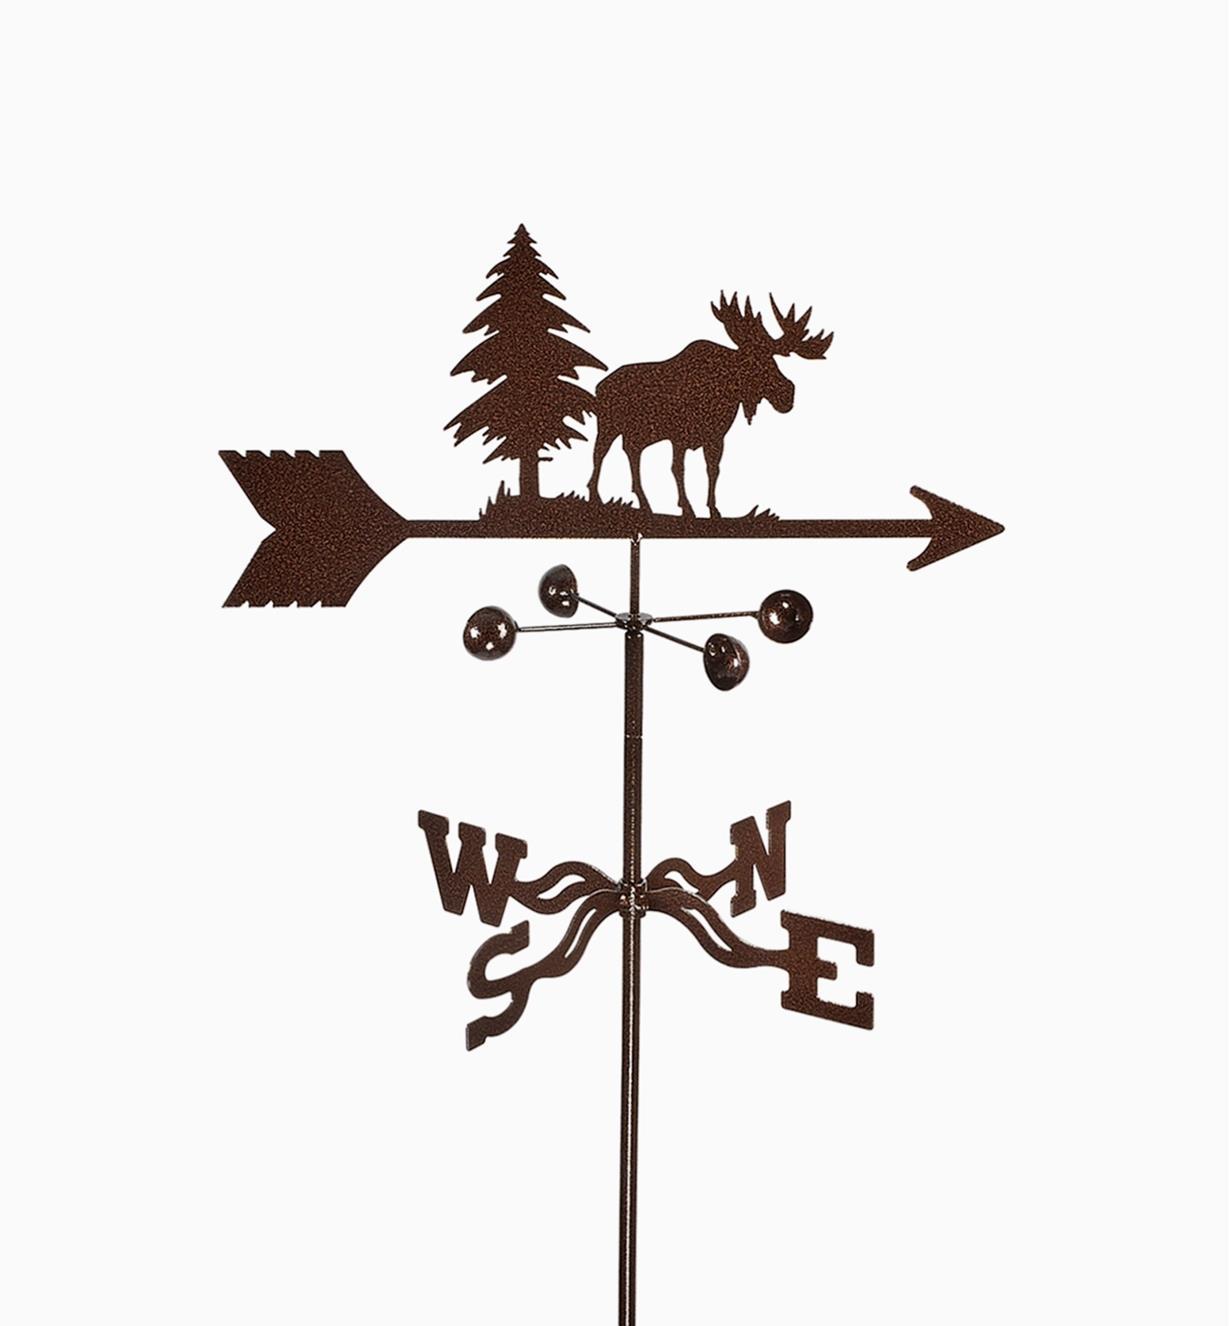 BV524 - Moose Weathervane, Garden